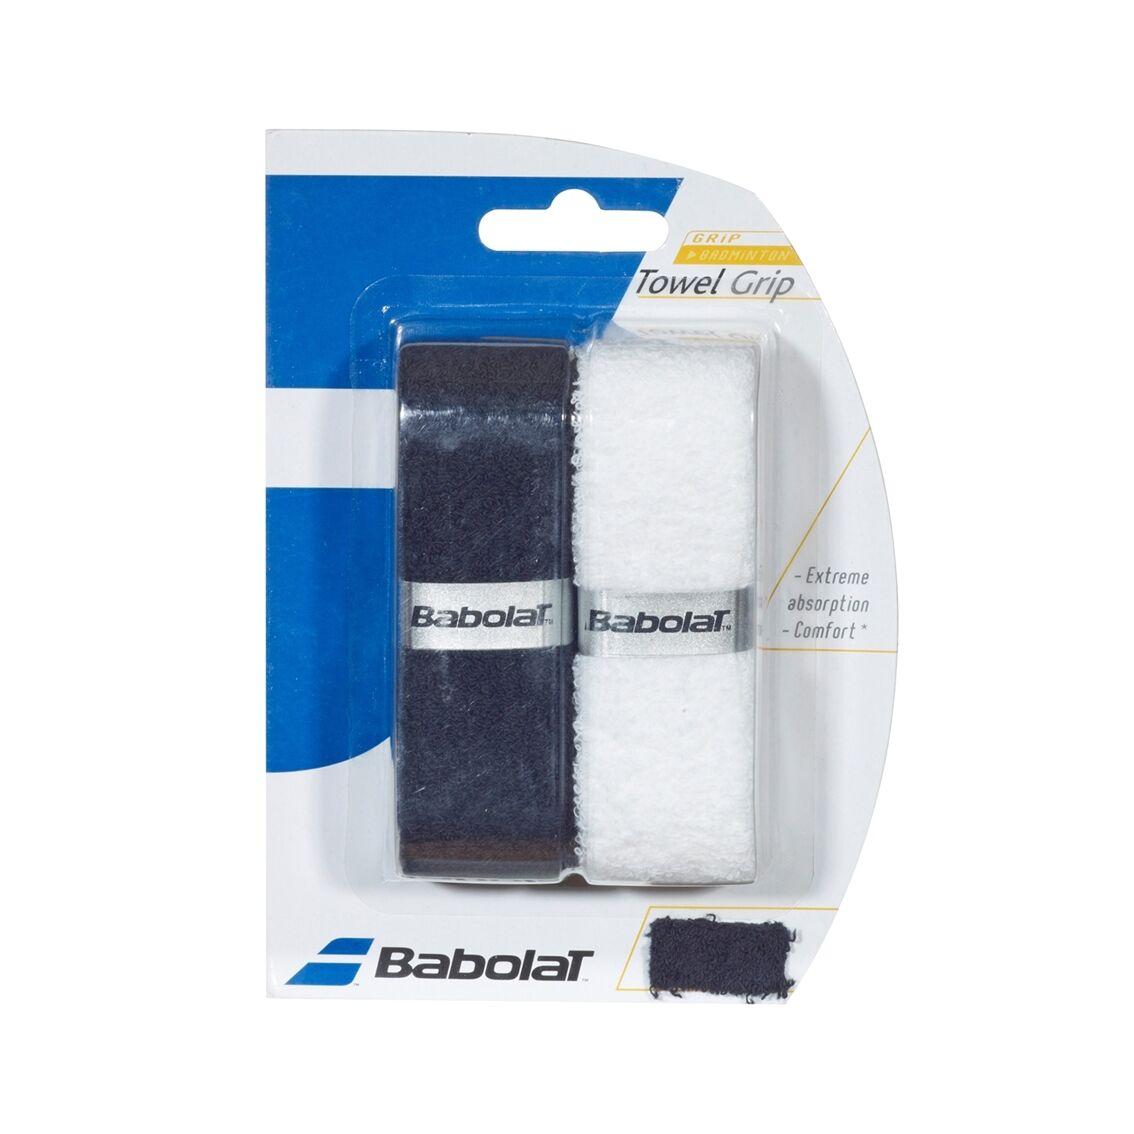 Babolat Towel Grip Black/White